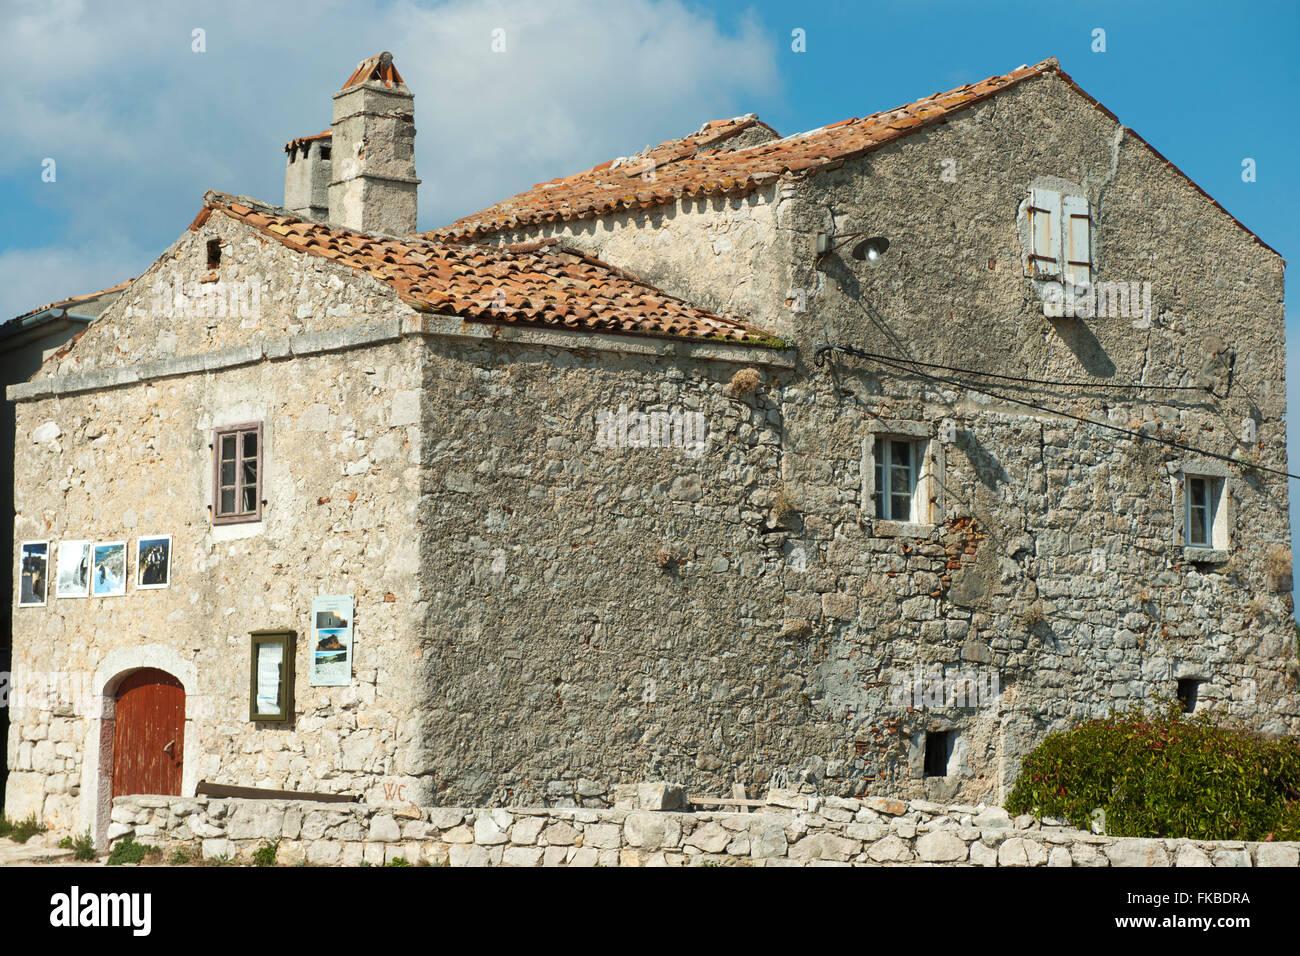 Kroatien, Insel Cres, Lubenice, Dorfhaus - Stock Image